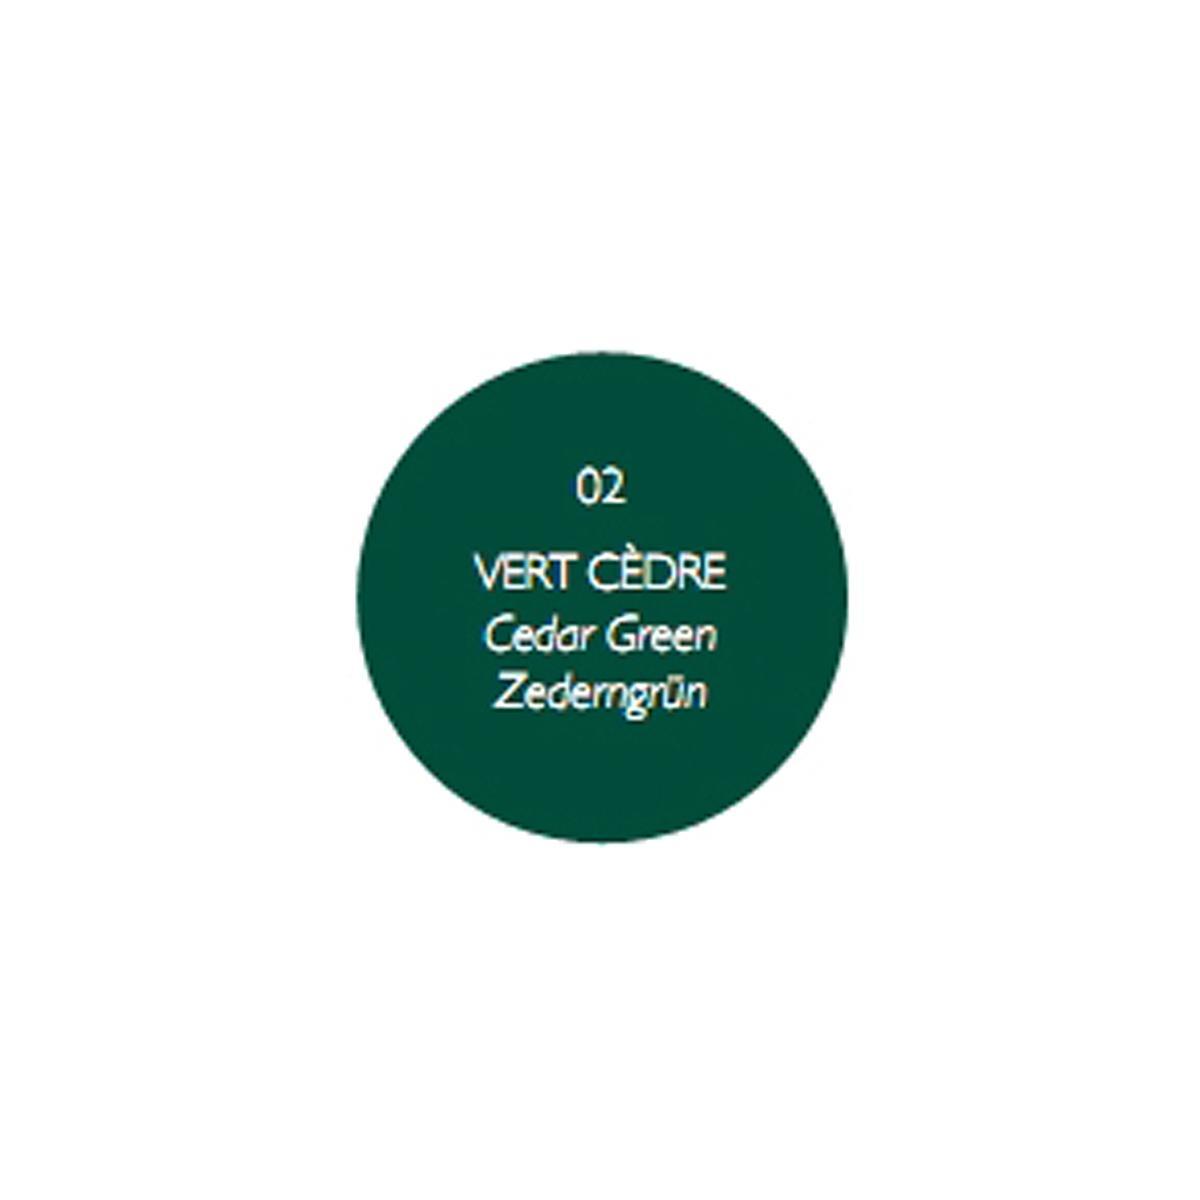 1900 by Fermob Chaise vert cèdre